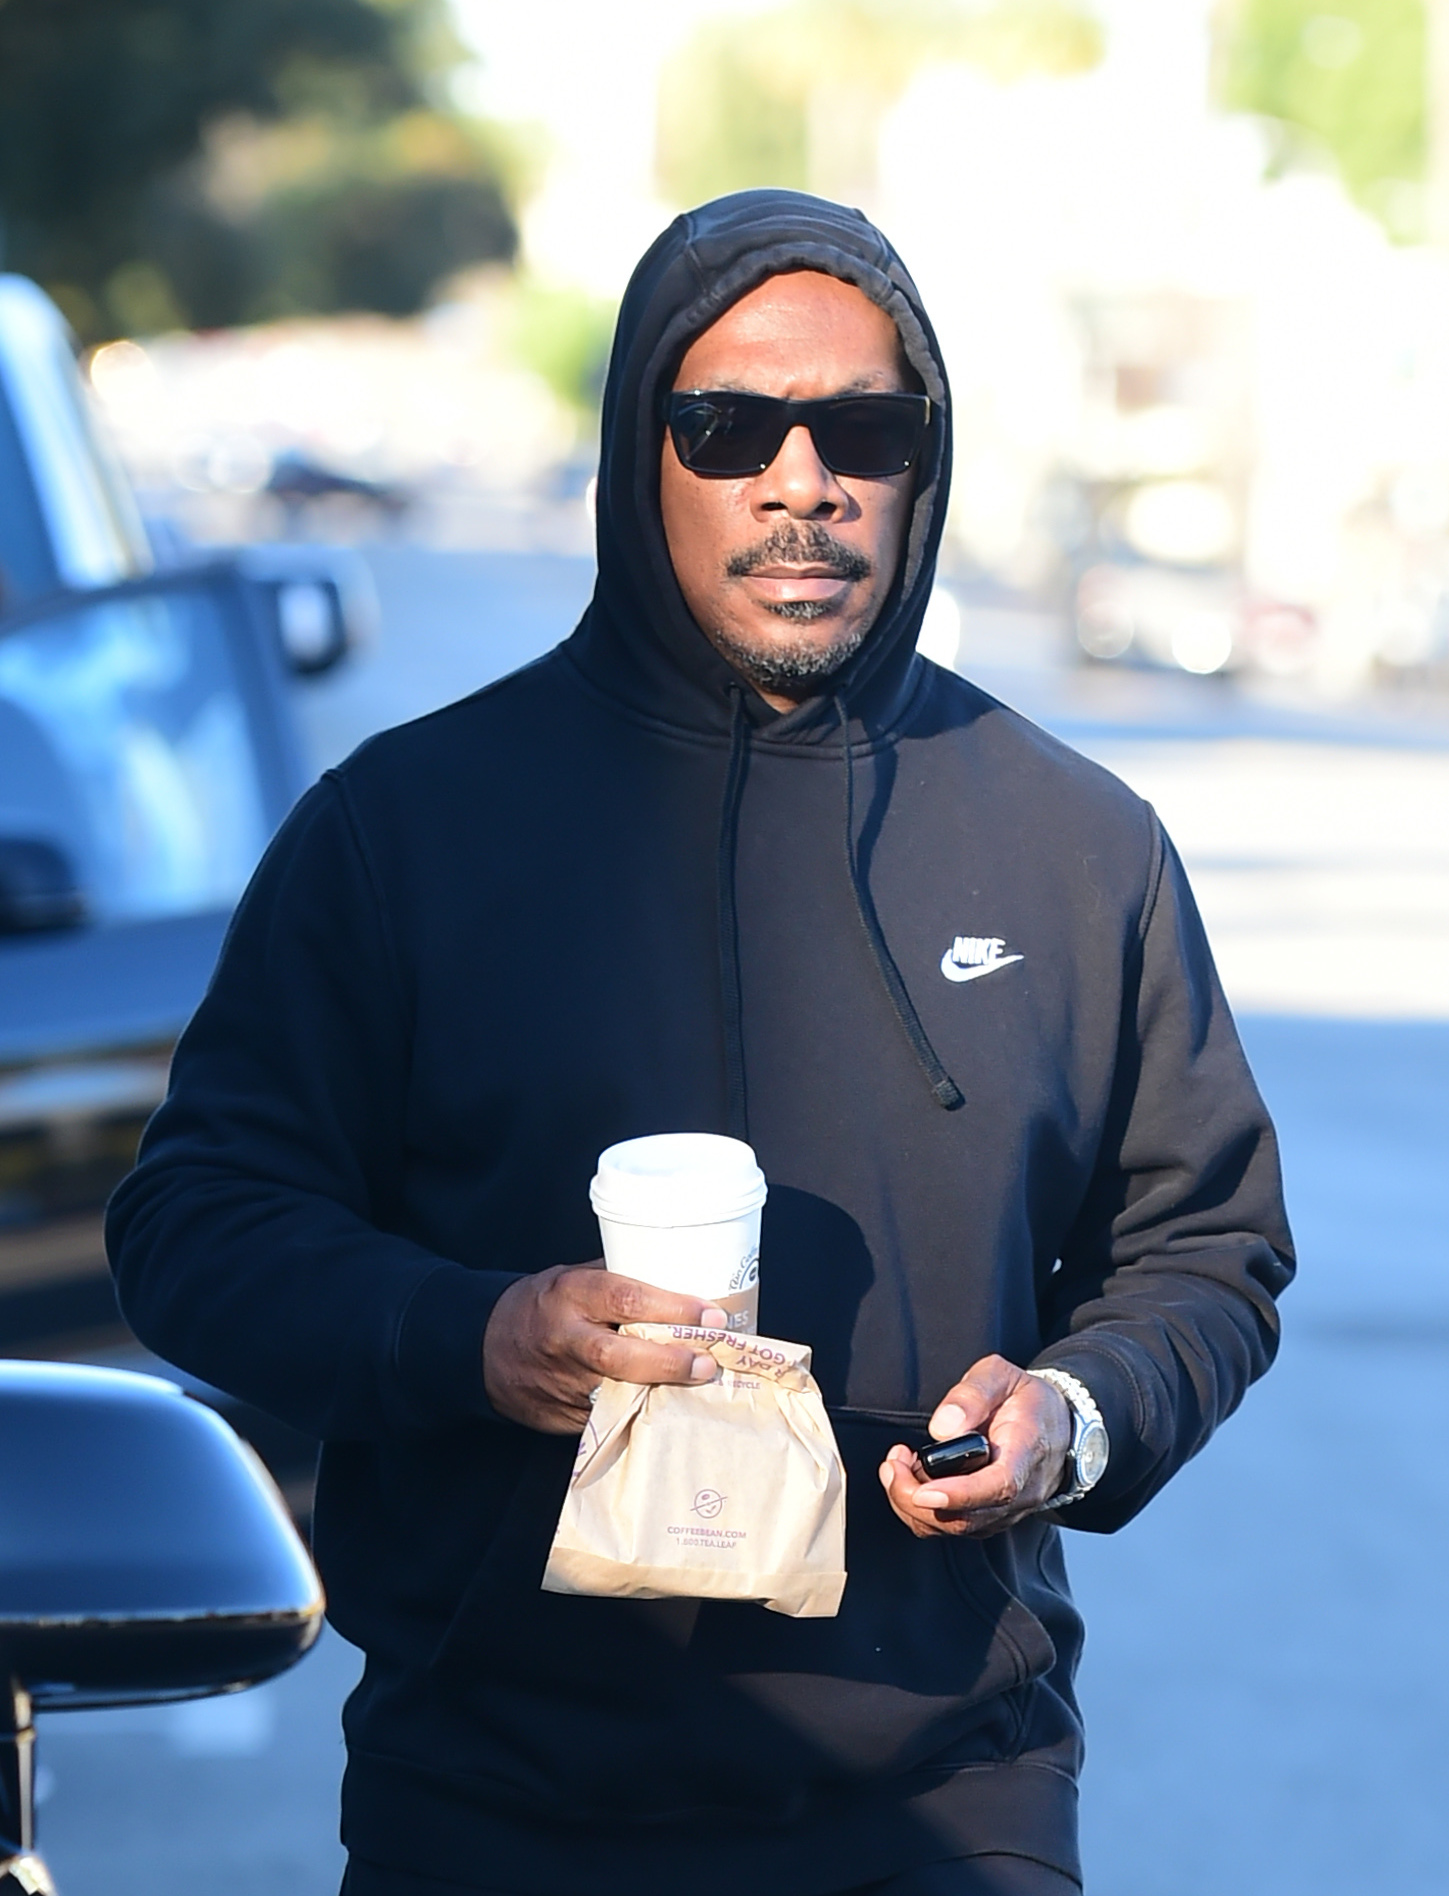 Eddie Murphy wears a Nike hoodie during an early morning coffee run